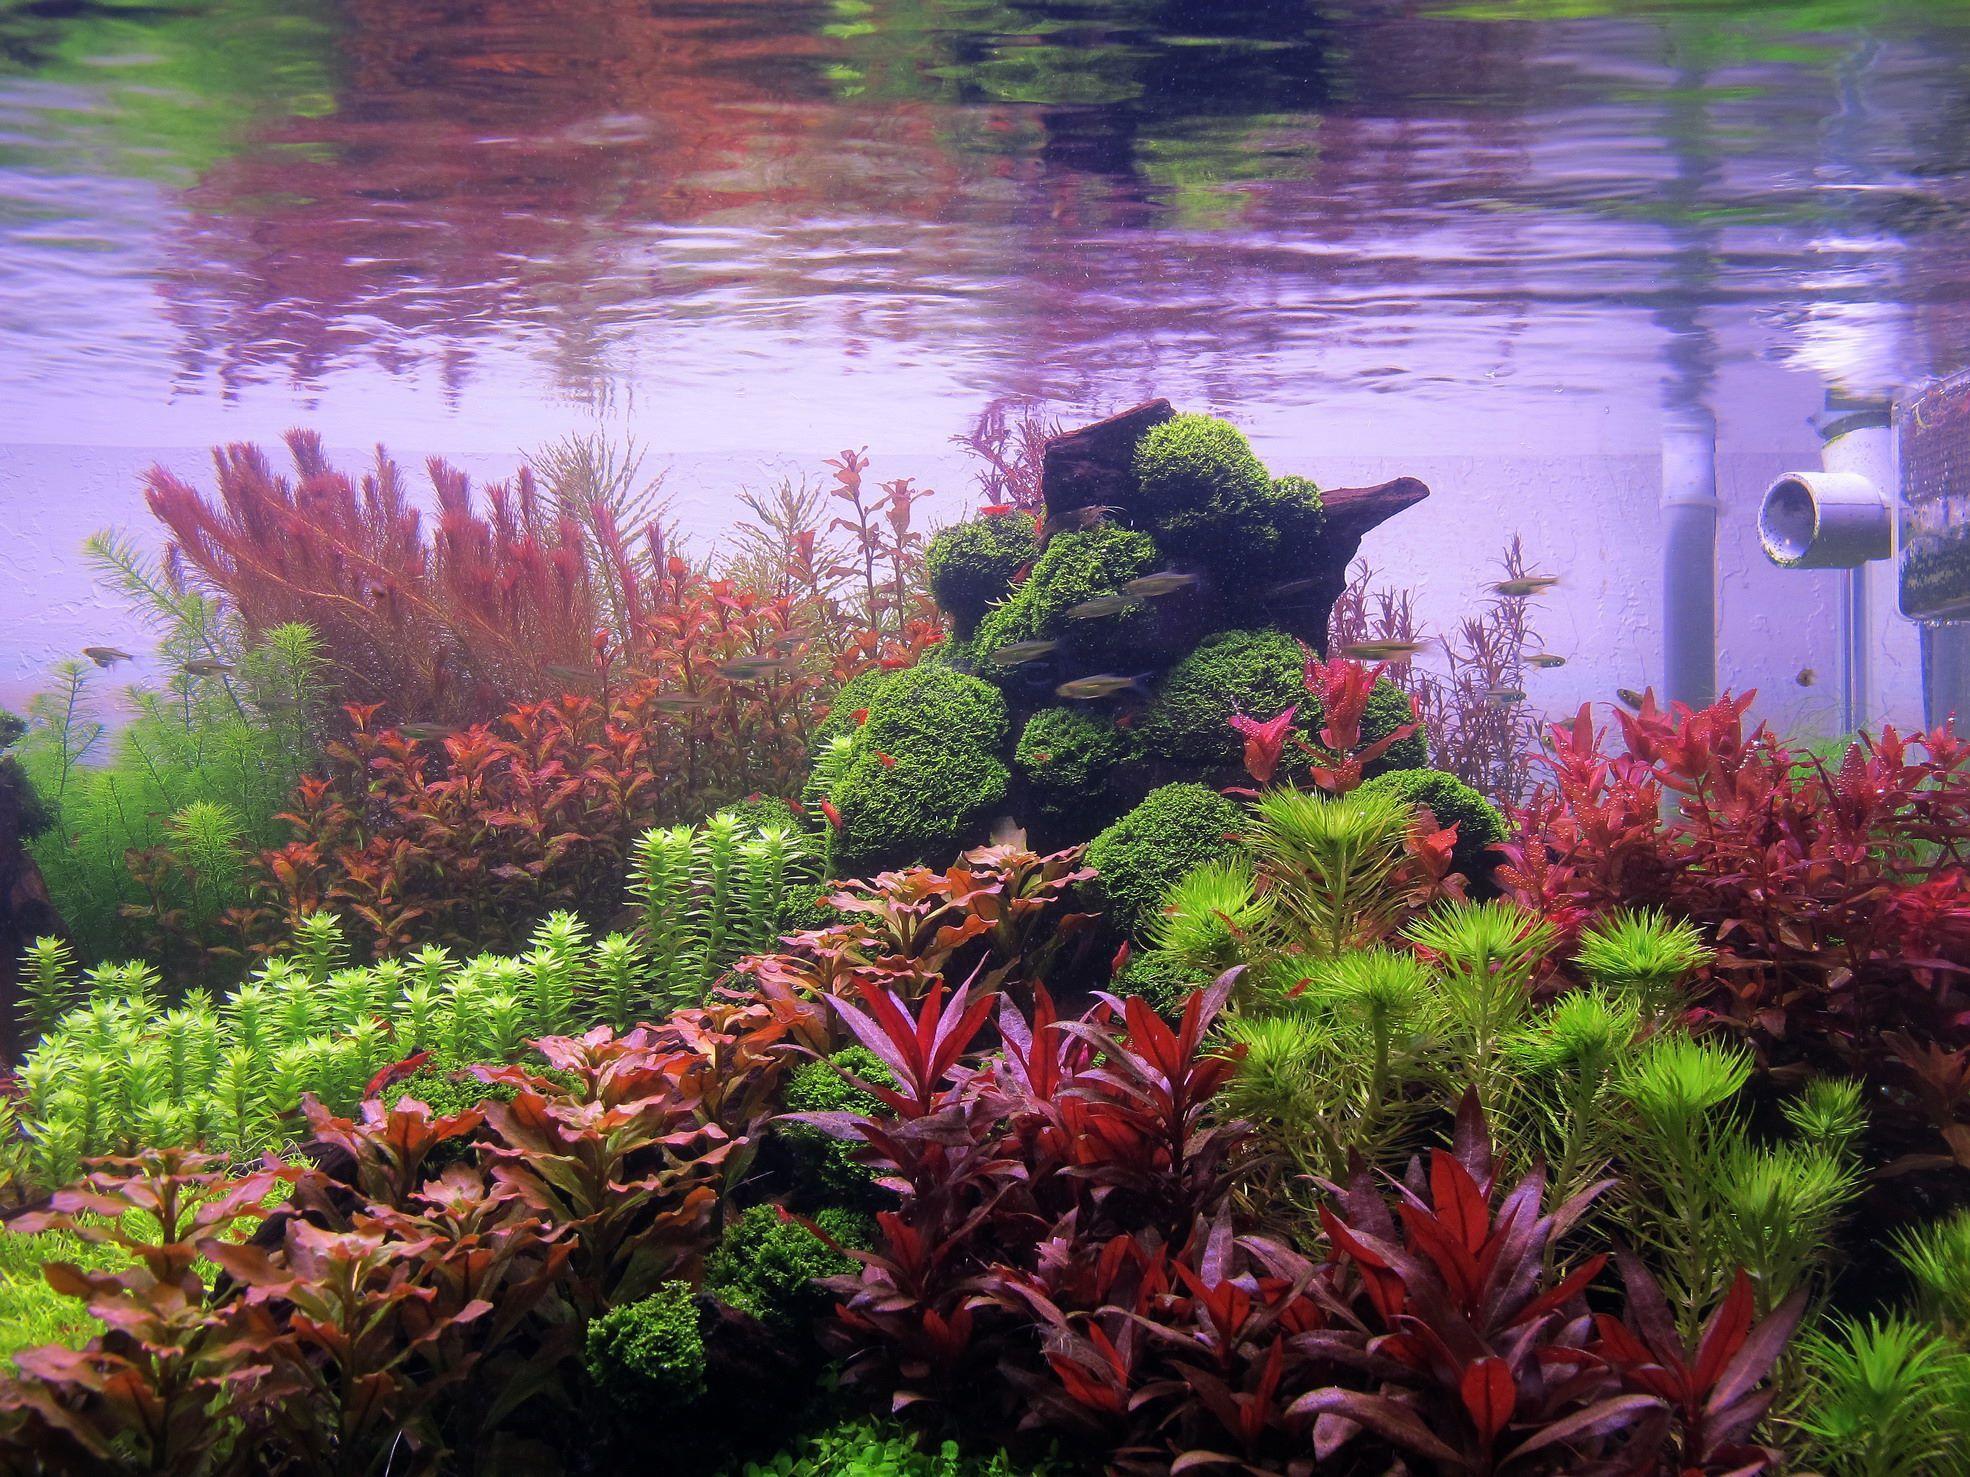 28fd0d5c3cf273e01b26f4808f0711bd Frais De Aquarium Tropical Schème